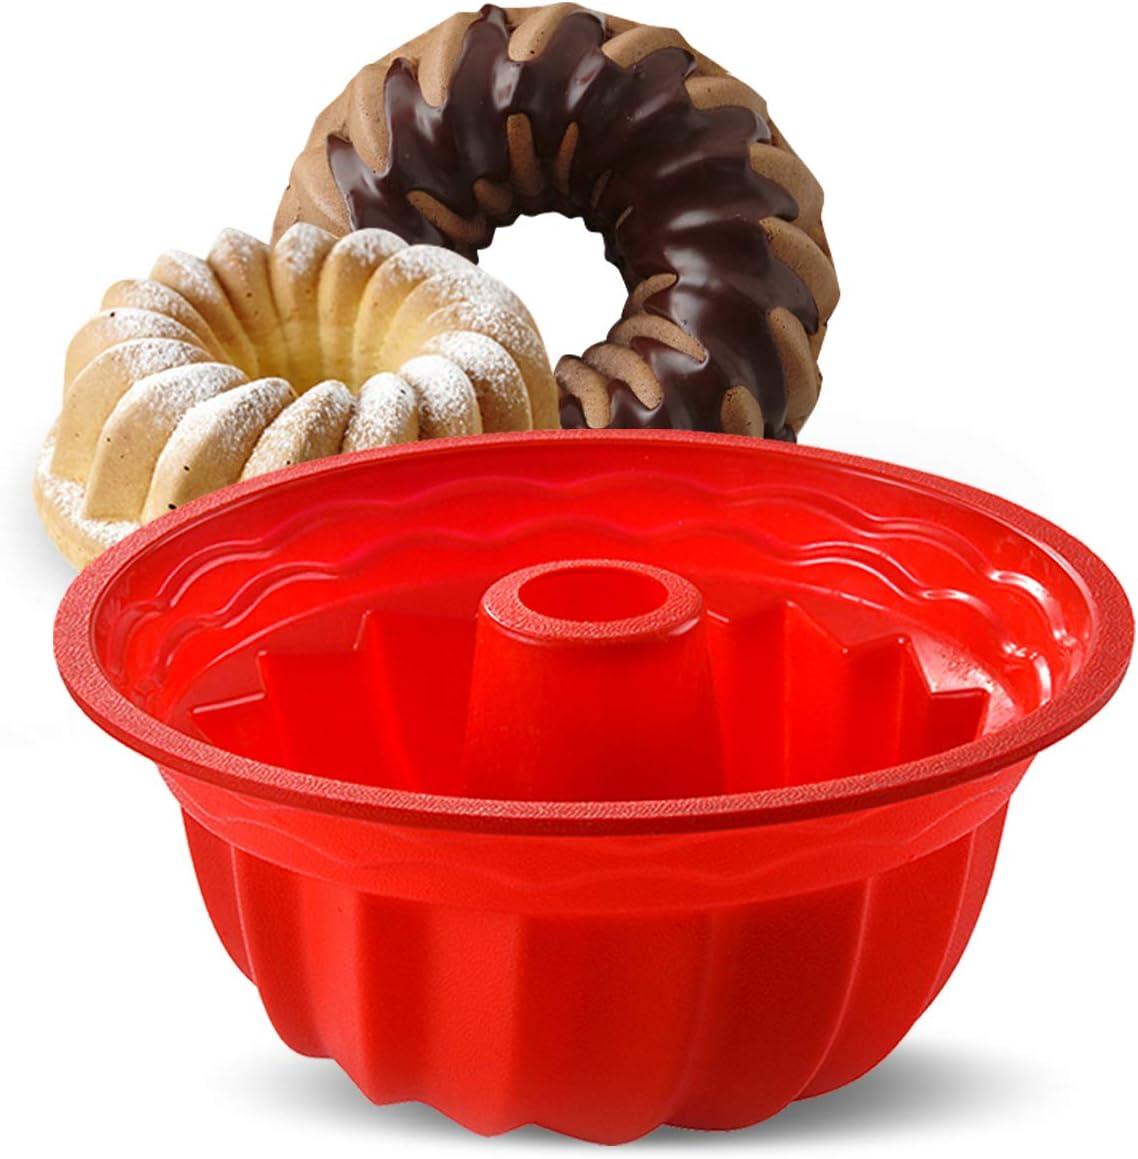 Aokinle Silicone Baking Molds, European Grade Fluted Round Cake Pan, Non-Stick Cake Pan for Jello,Buntcake,Gelatin,Bread, 9.45 Inches Tube Bakeware Red